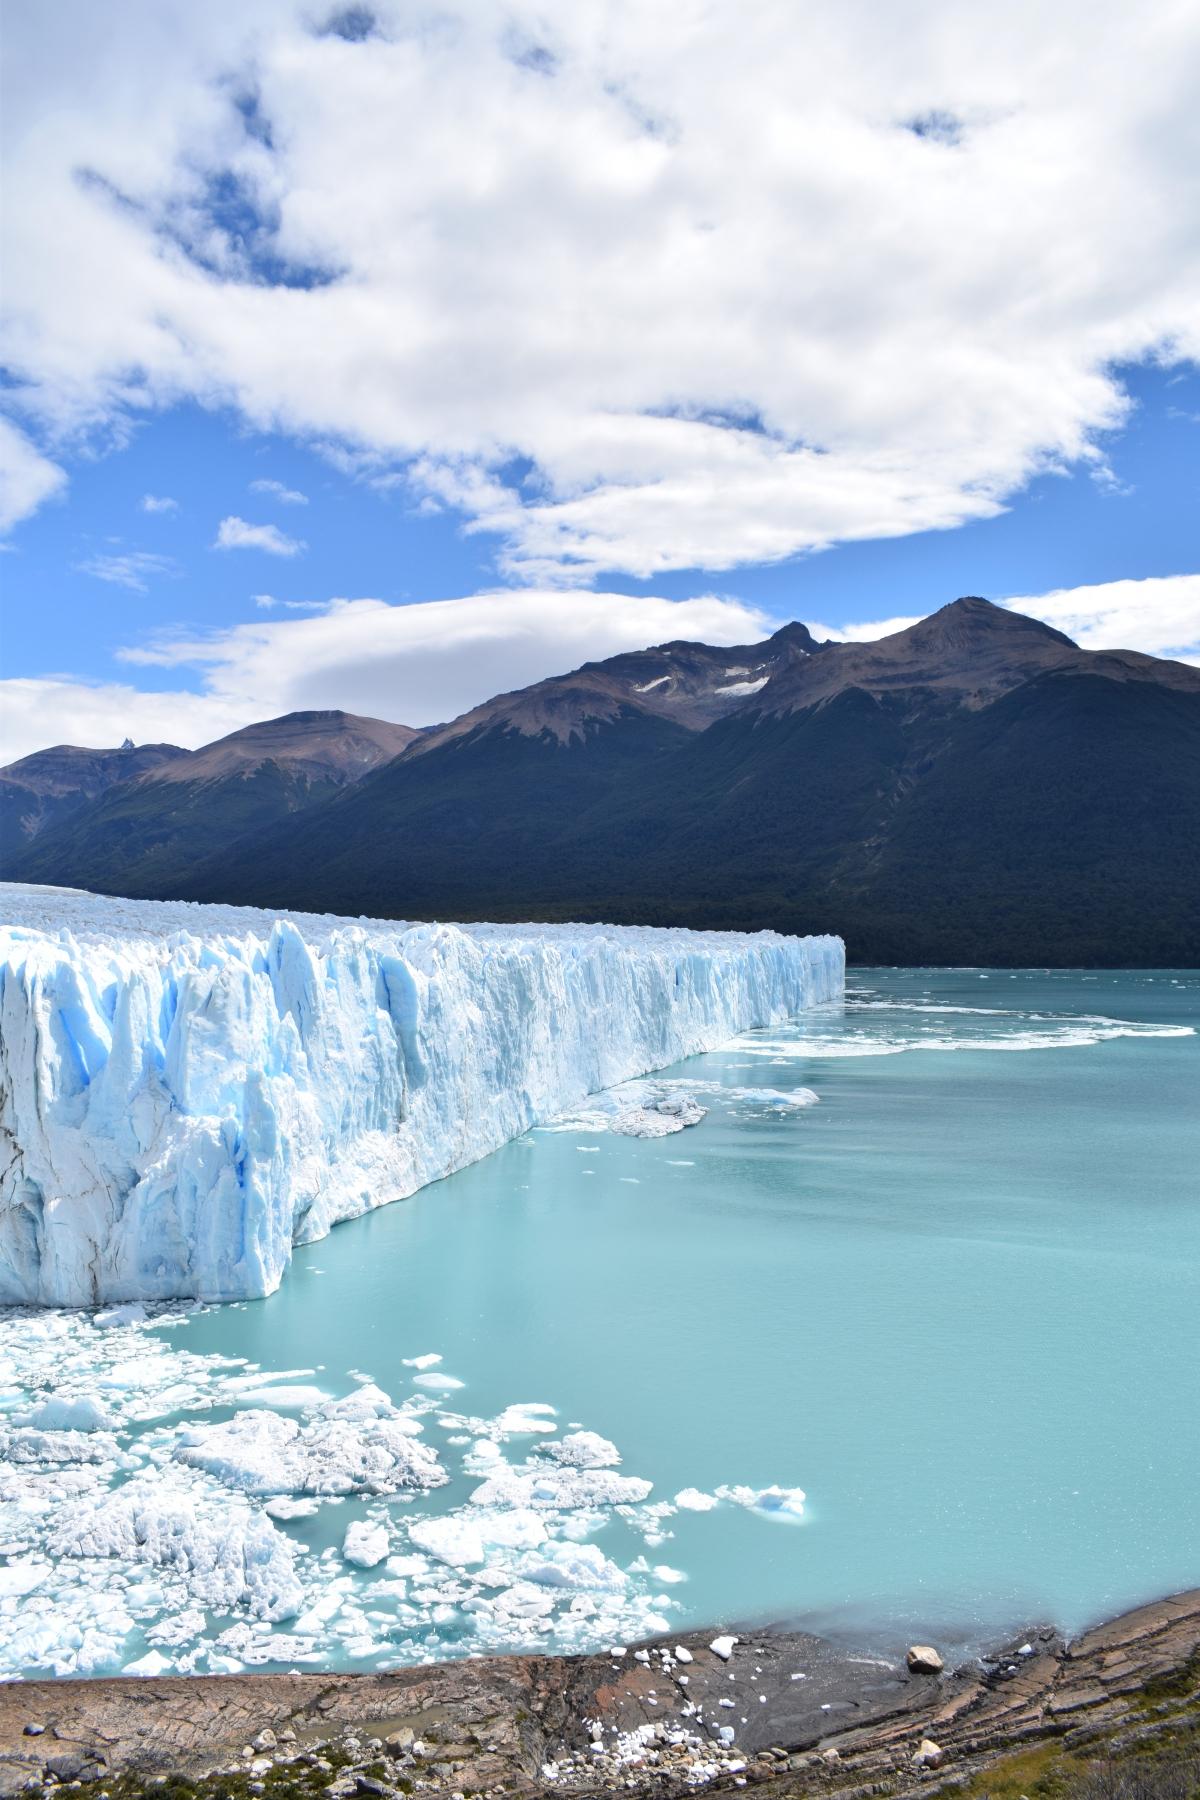 Patagonien og Ildlandet eller Iguazúvandfaldene?